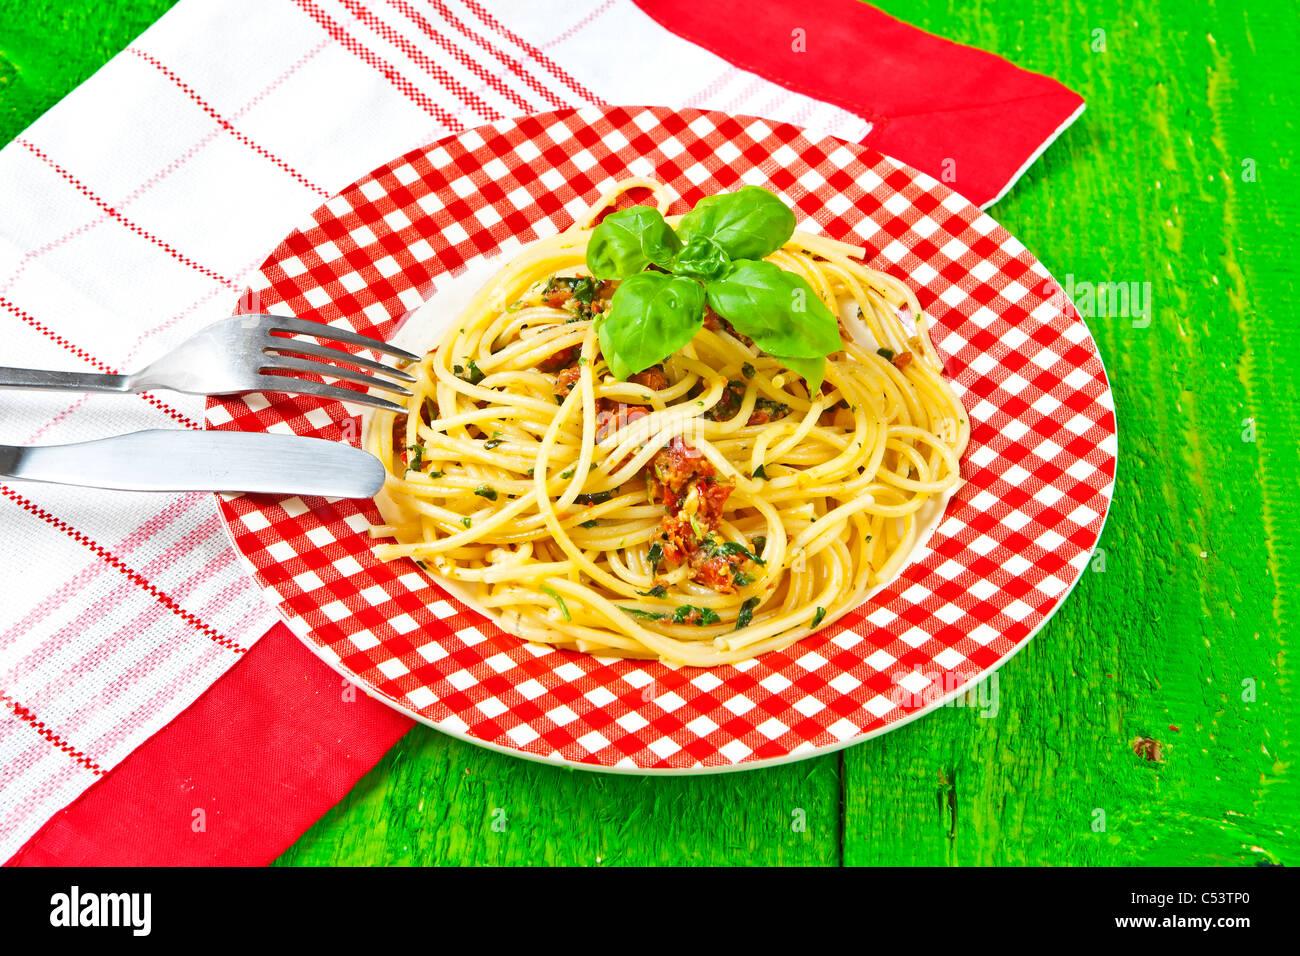 Espaguetis con pesto, hecha de tomates secos, queso grana, pecorino, rúcula, albahaca, piñones y ajo. Imagen De Stock